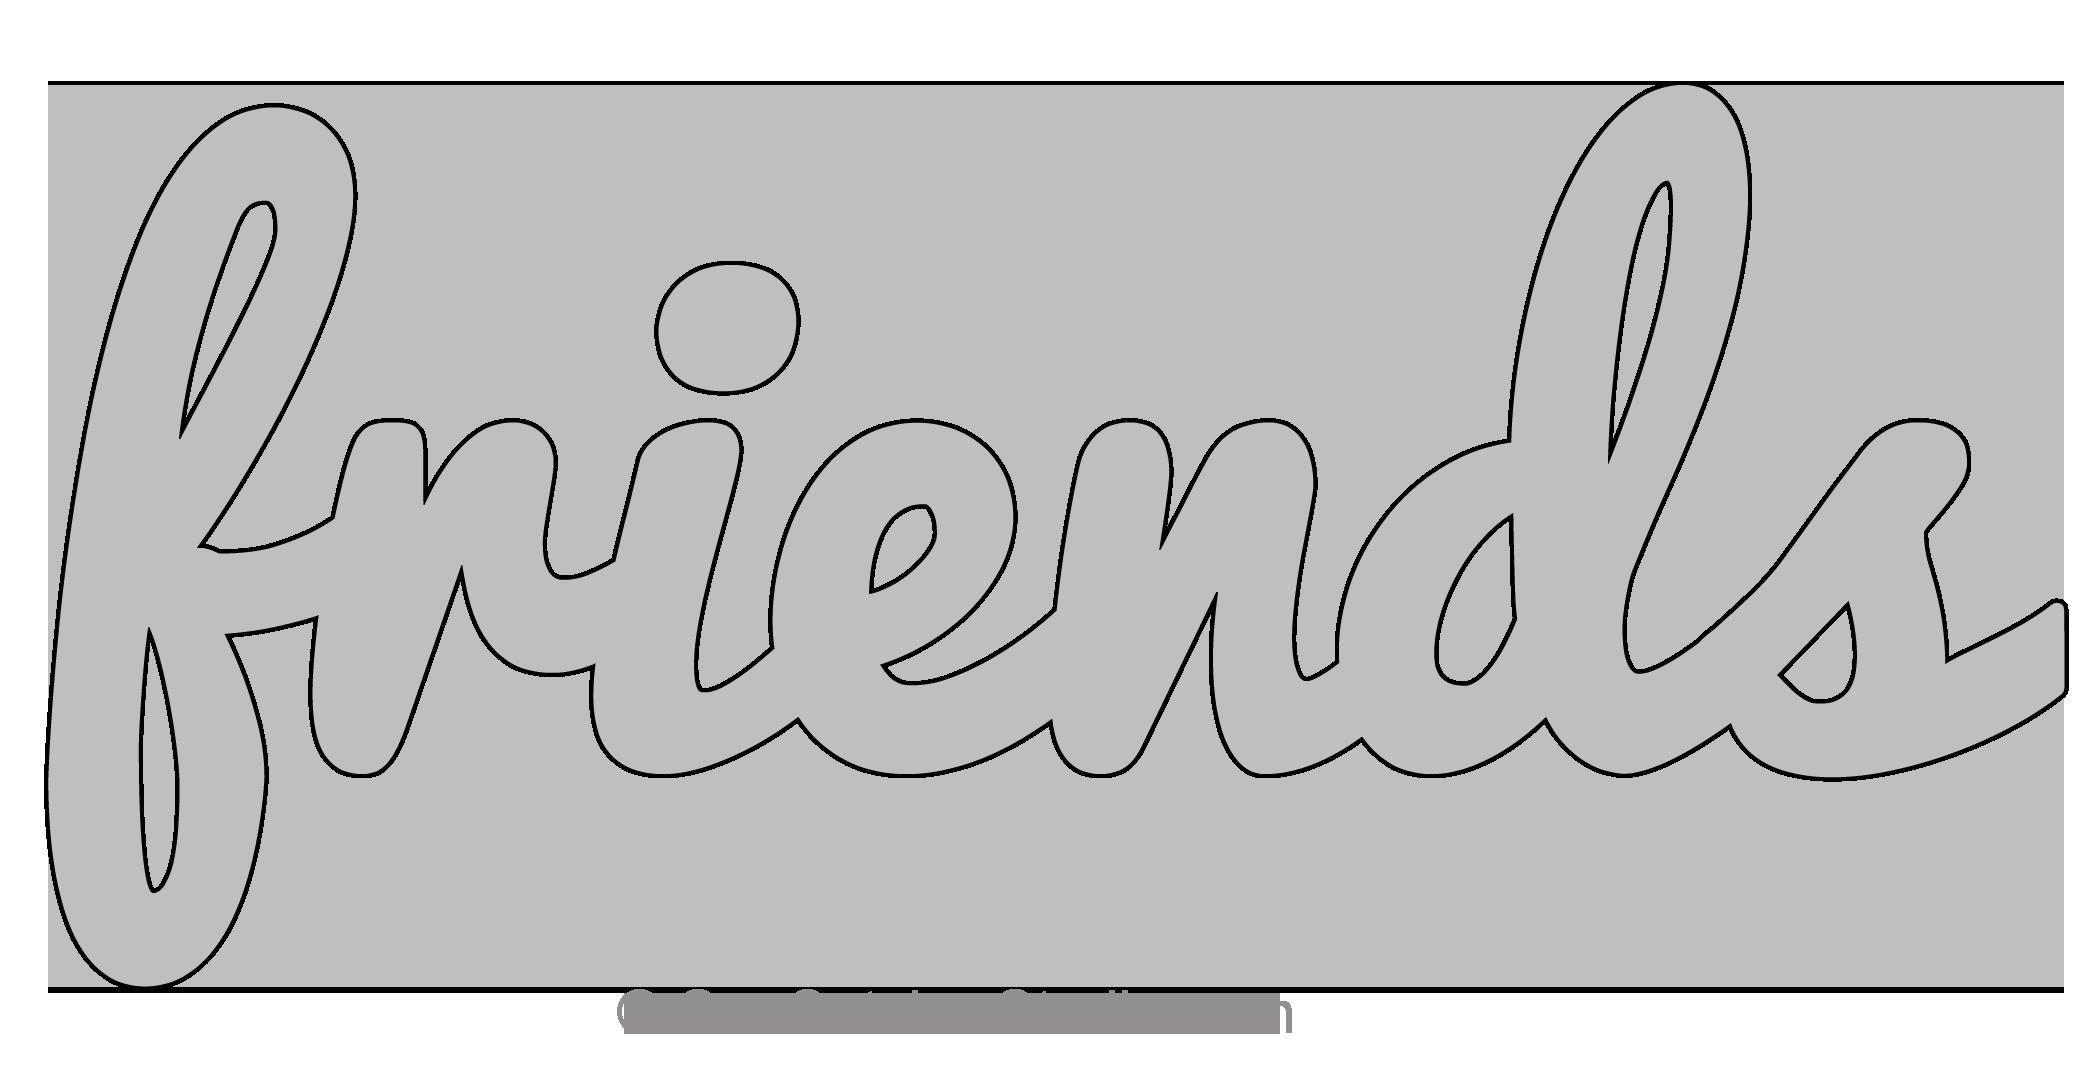 Word Art Patterns Templates Stencils Free Printable Designs With Images Free Stencils Printables Templates Stencils Printables Templates Free Word Art